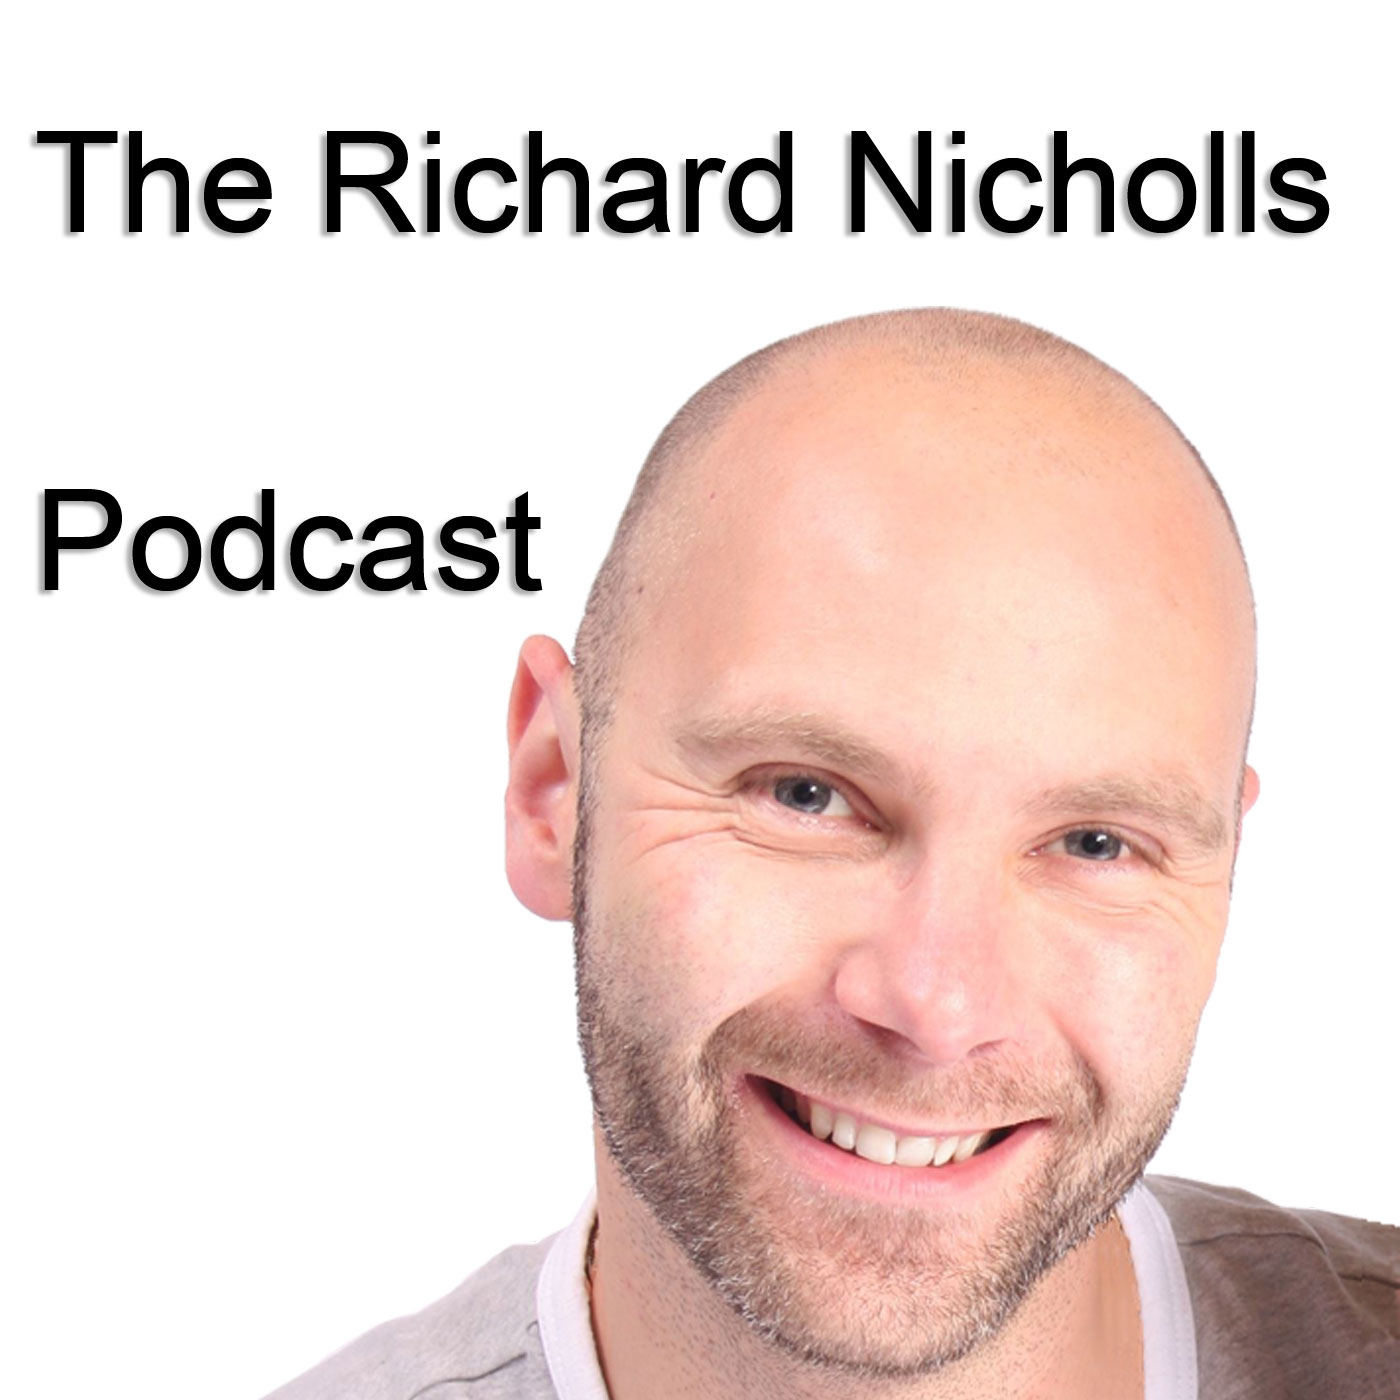 The-Richard-Nicholls-Podcast-Artwork.jpg